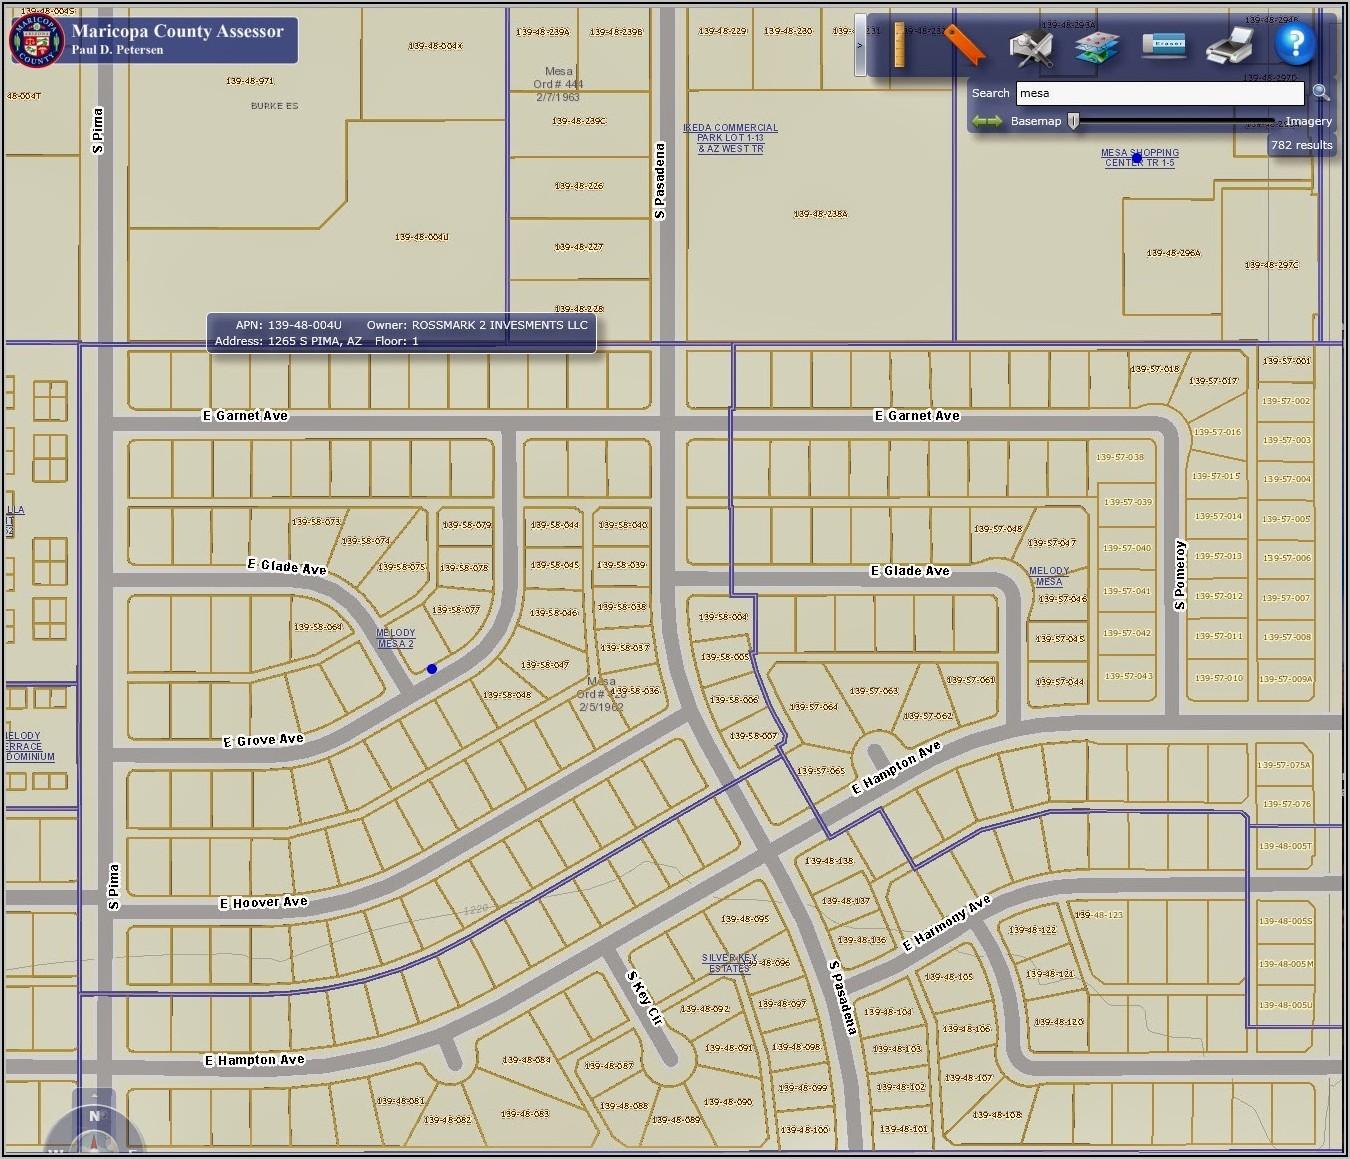 Maricopa County Assessor Historical Maps